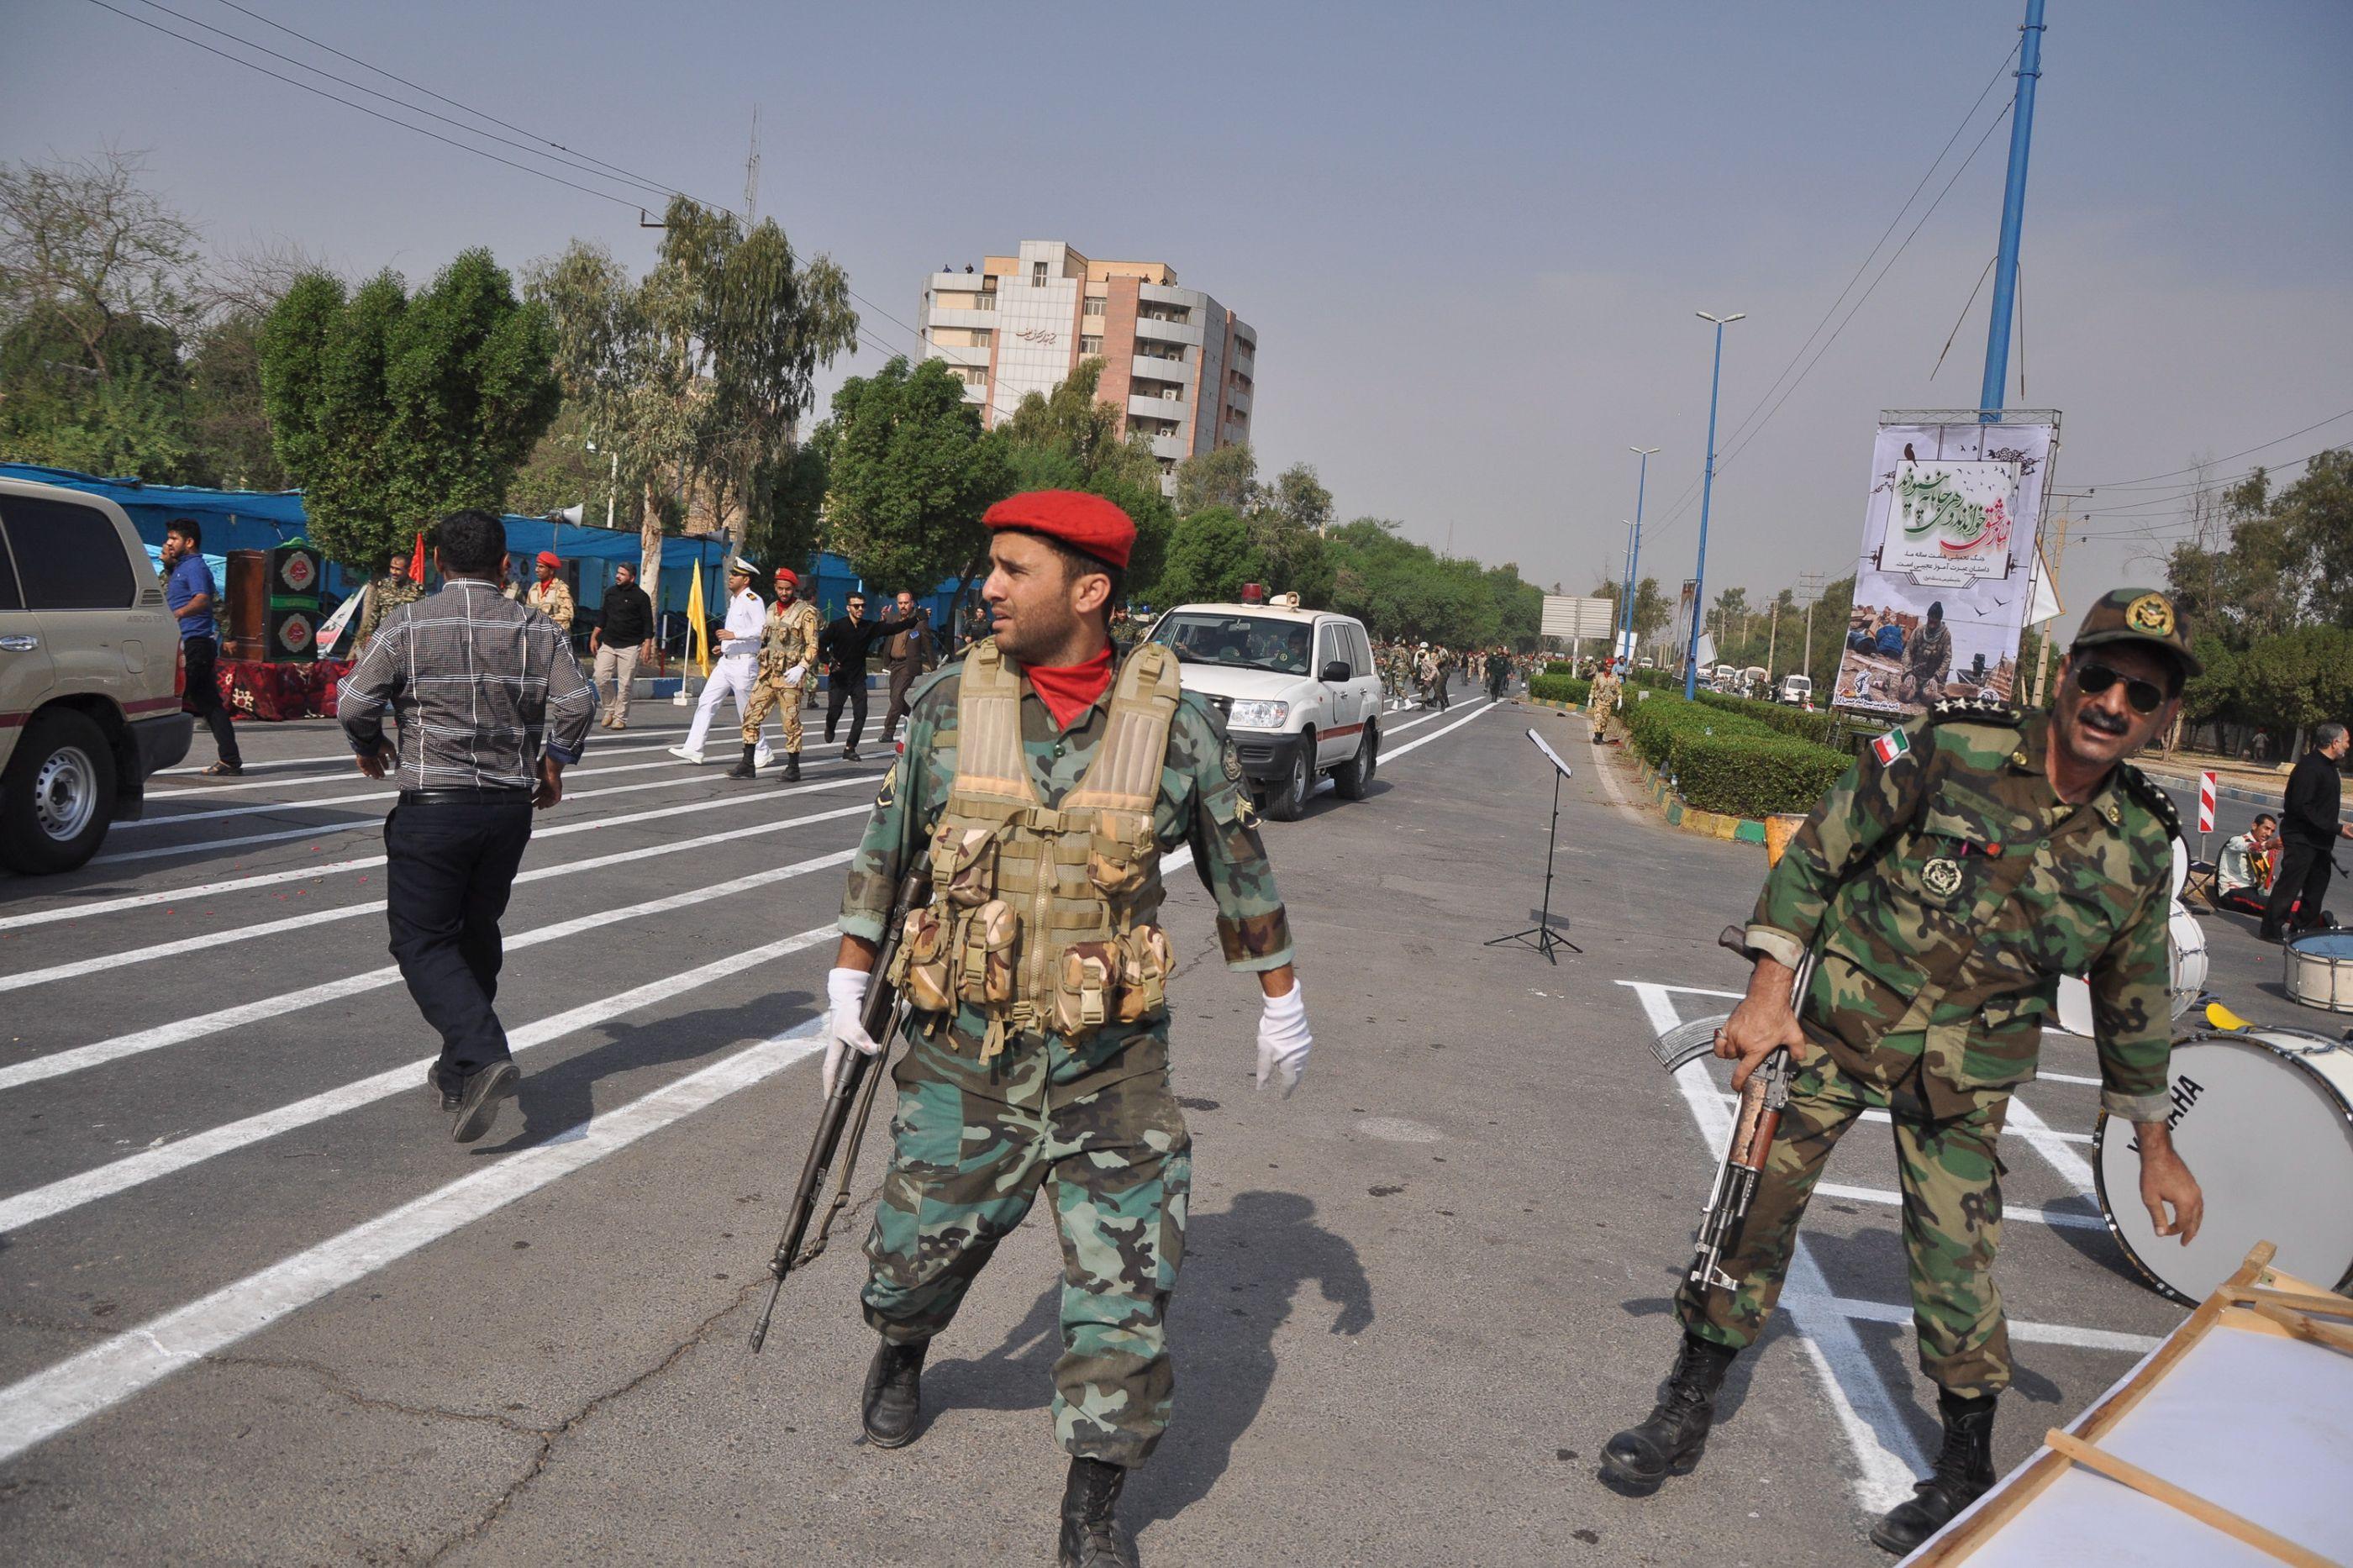 Estado Islâmico reivindica ataque durante desfile militar no Irã